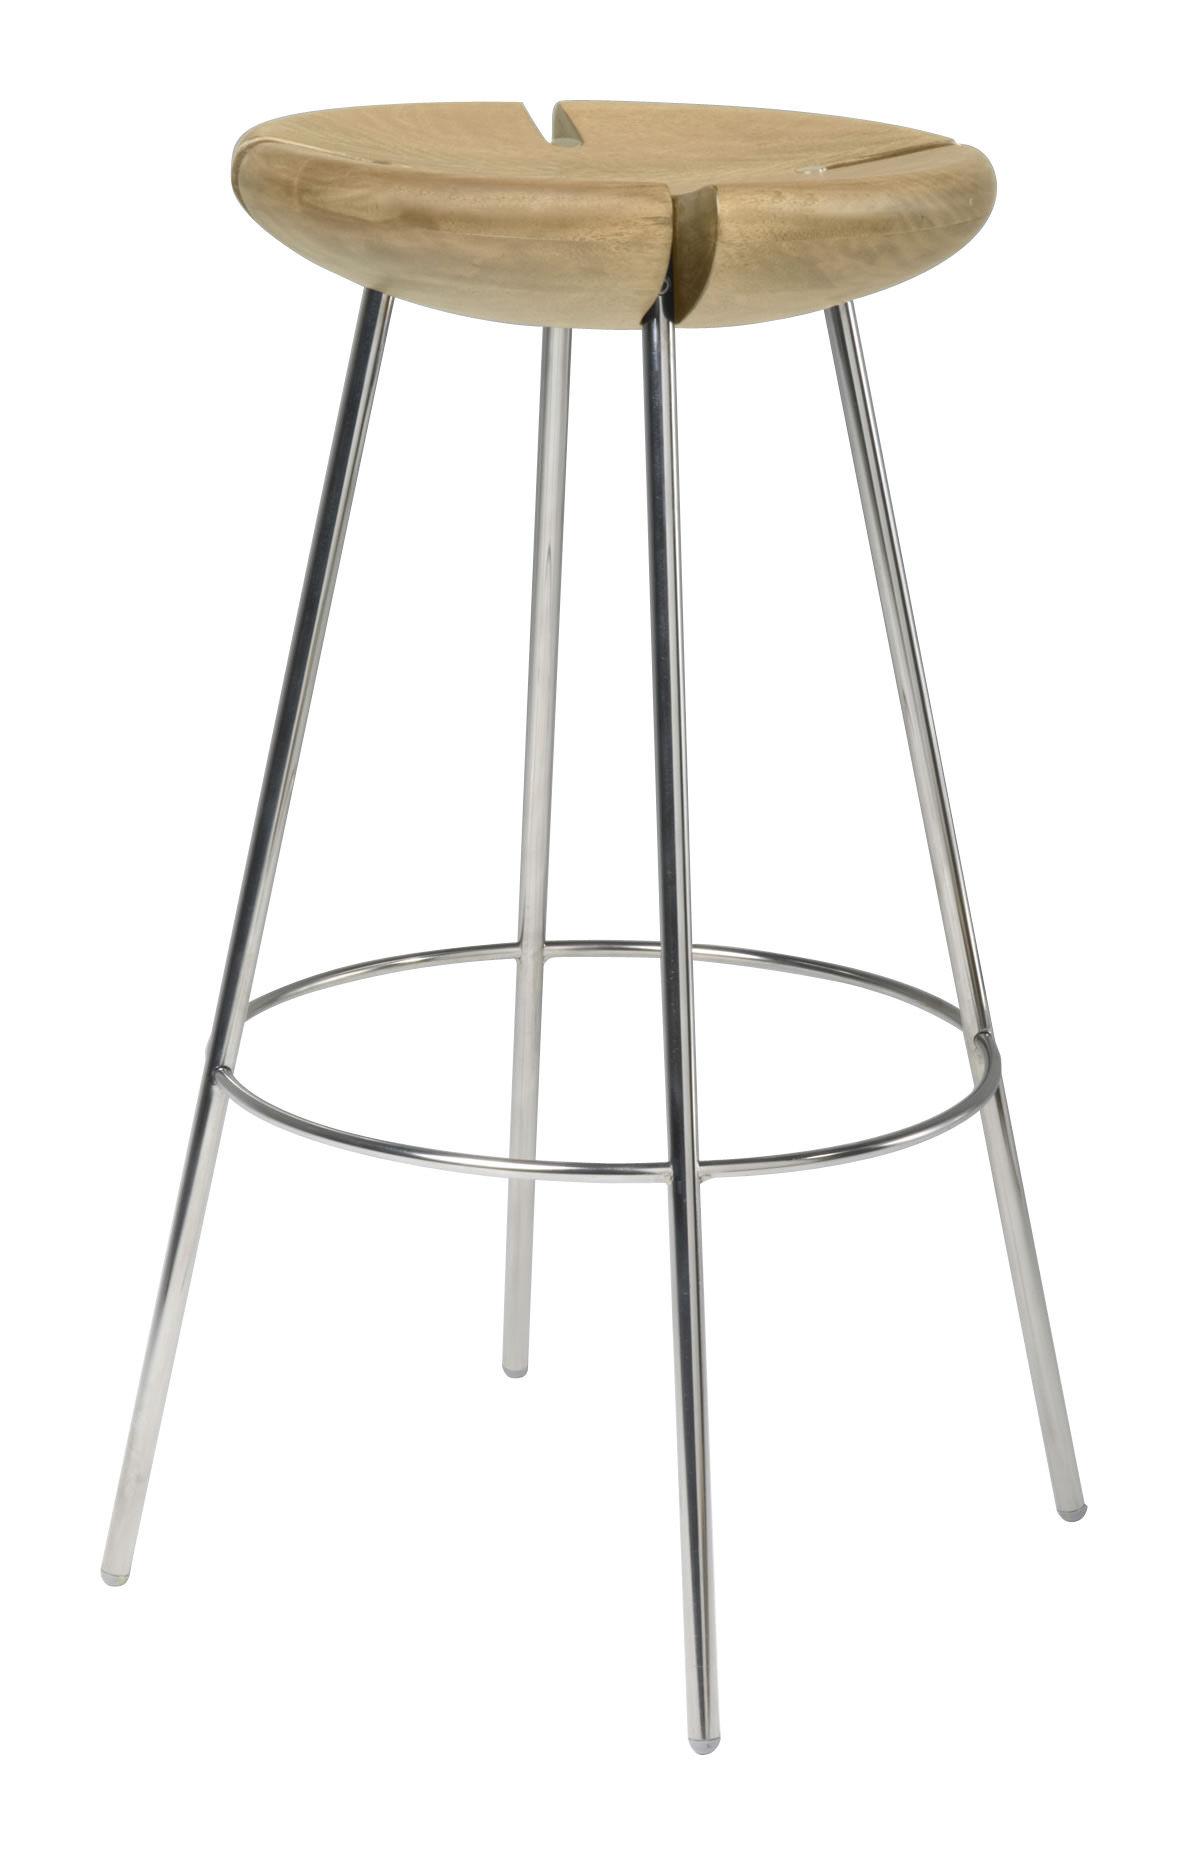 Tribo Bar stool H 76 cm Wood amp metal legs solid oak  : 74d10e03 f5d9 4d9b abad 4f905db8630b from www.madeindesign.co.uk size 1188 x 1855 jpeg 87kB